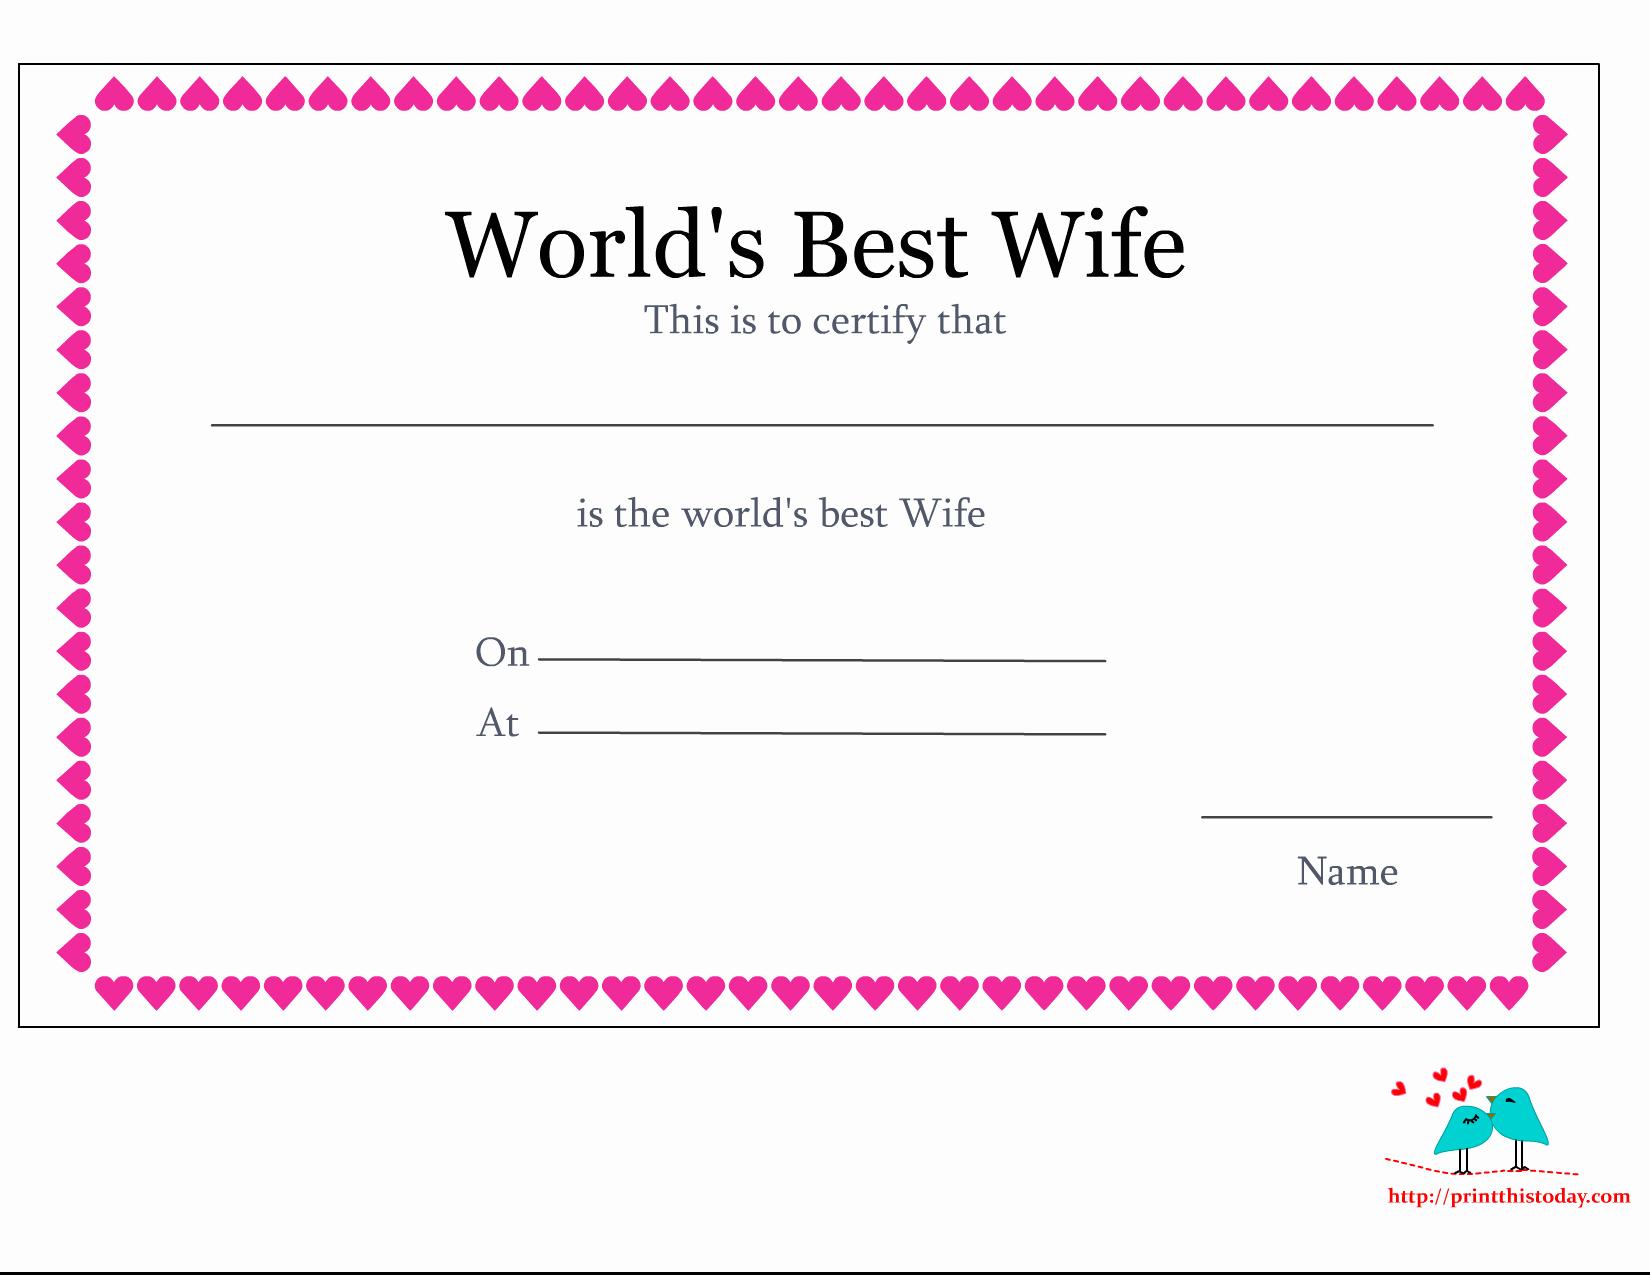 World's Best Boyfriend Award Lovely Free Printable World S Best Wife Certificates